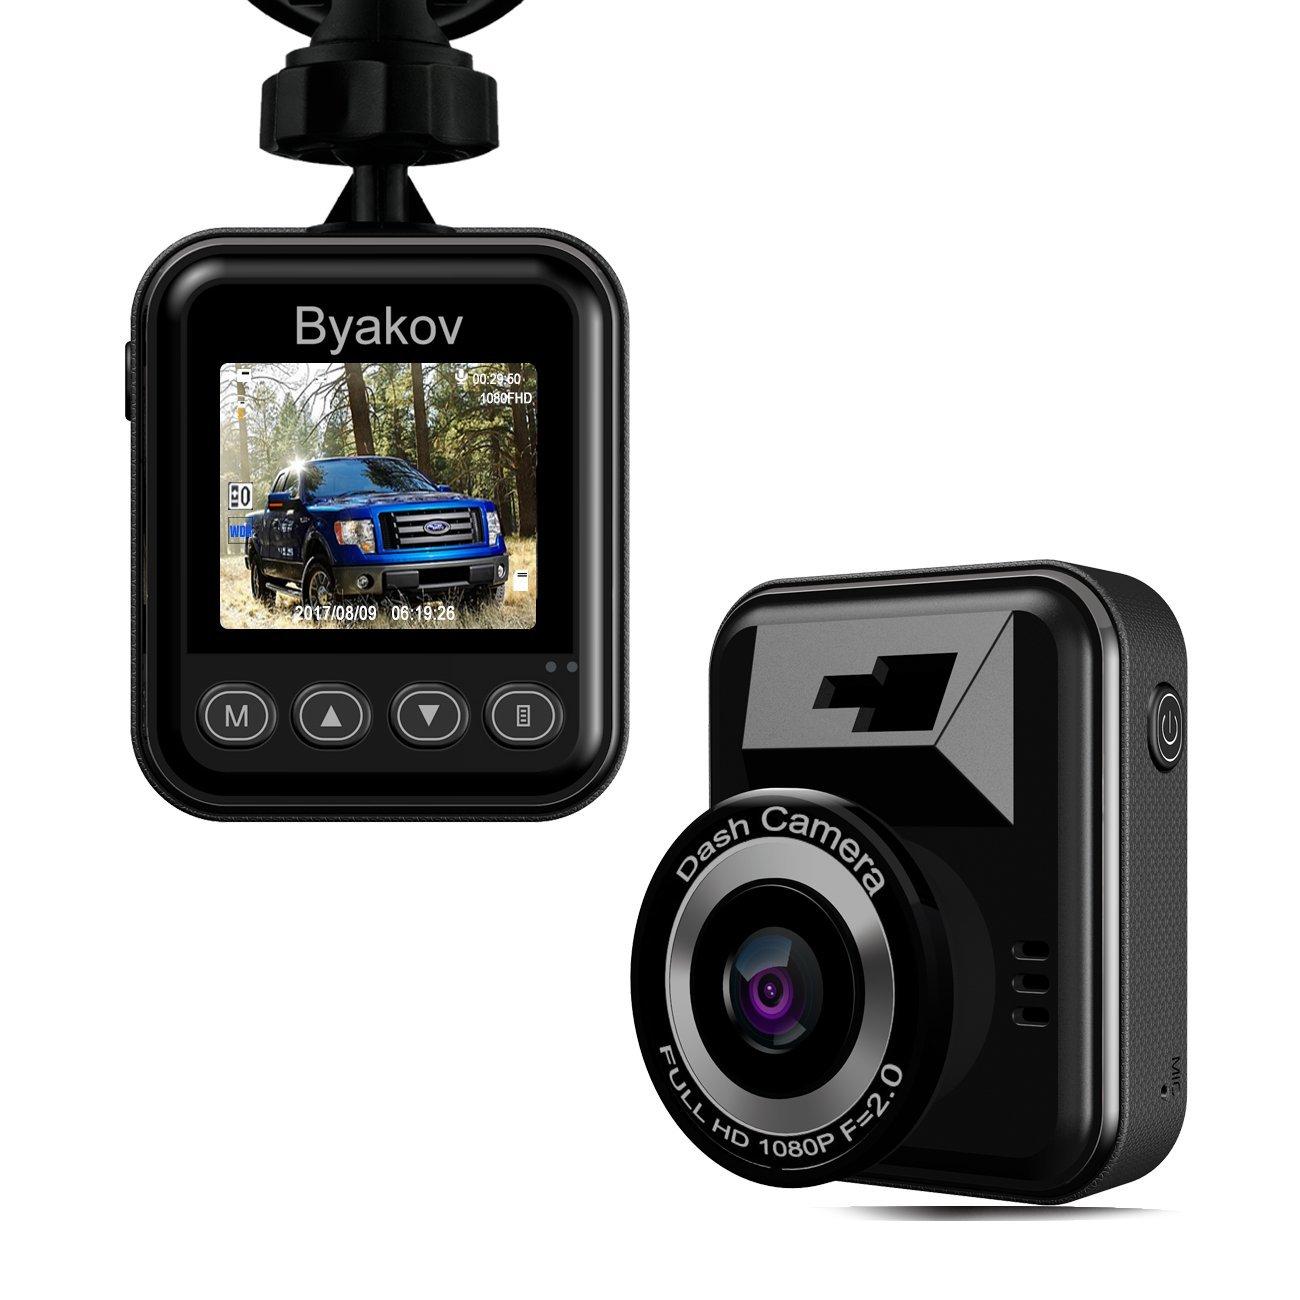 Caméra embarquée Byakov Dashcam - Full HD (Vendeur Tiers)